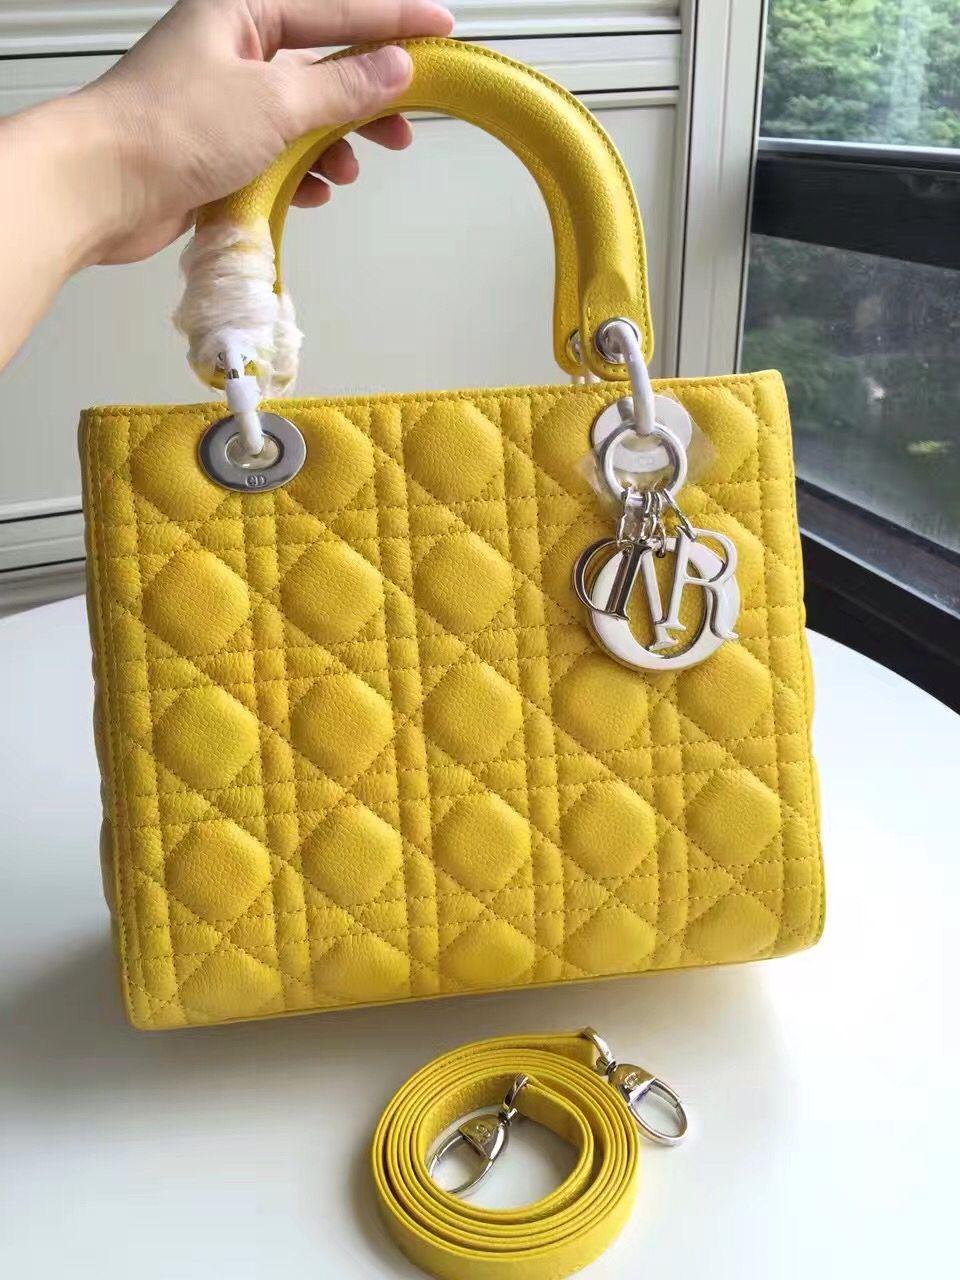 57ff2a7d2 Dior Lady Dior Medium Bag In Caviar Calfskin Yellow (Silver Hardware ...